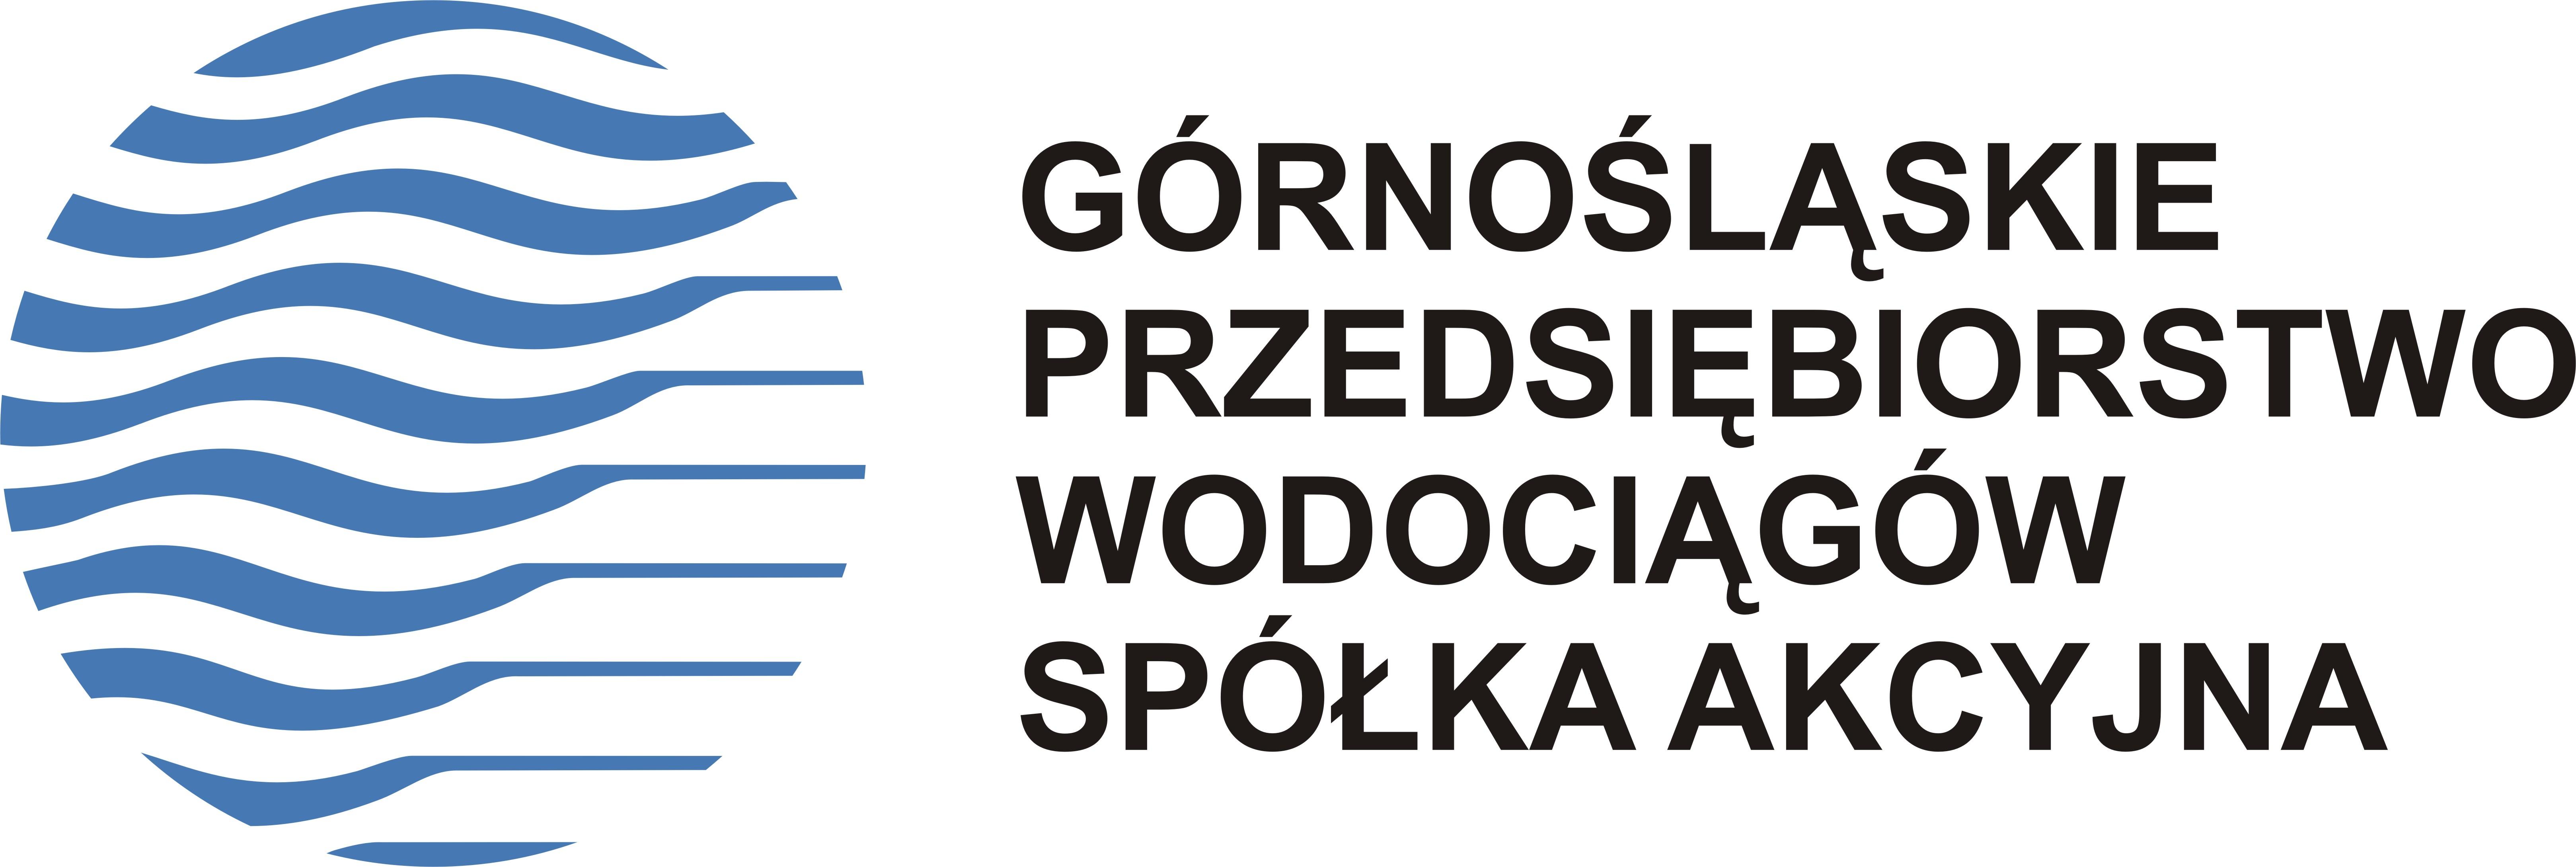 GPW S.A.